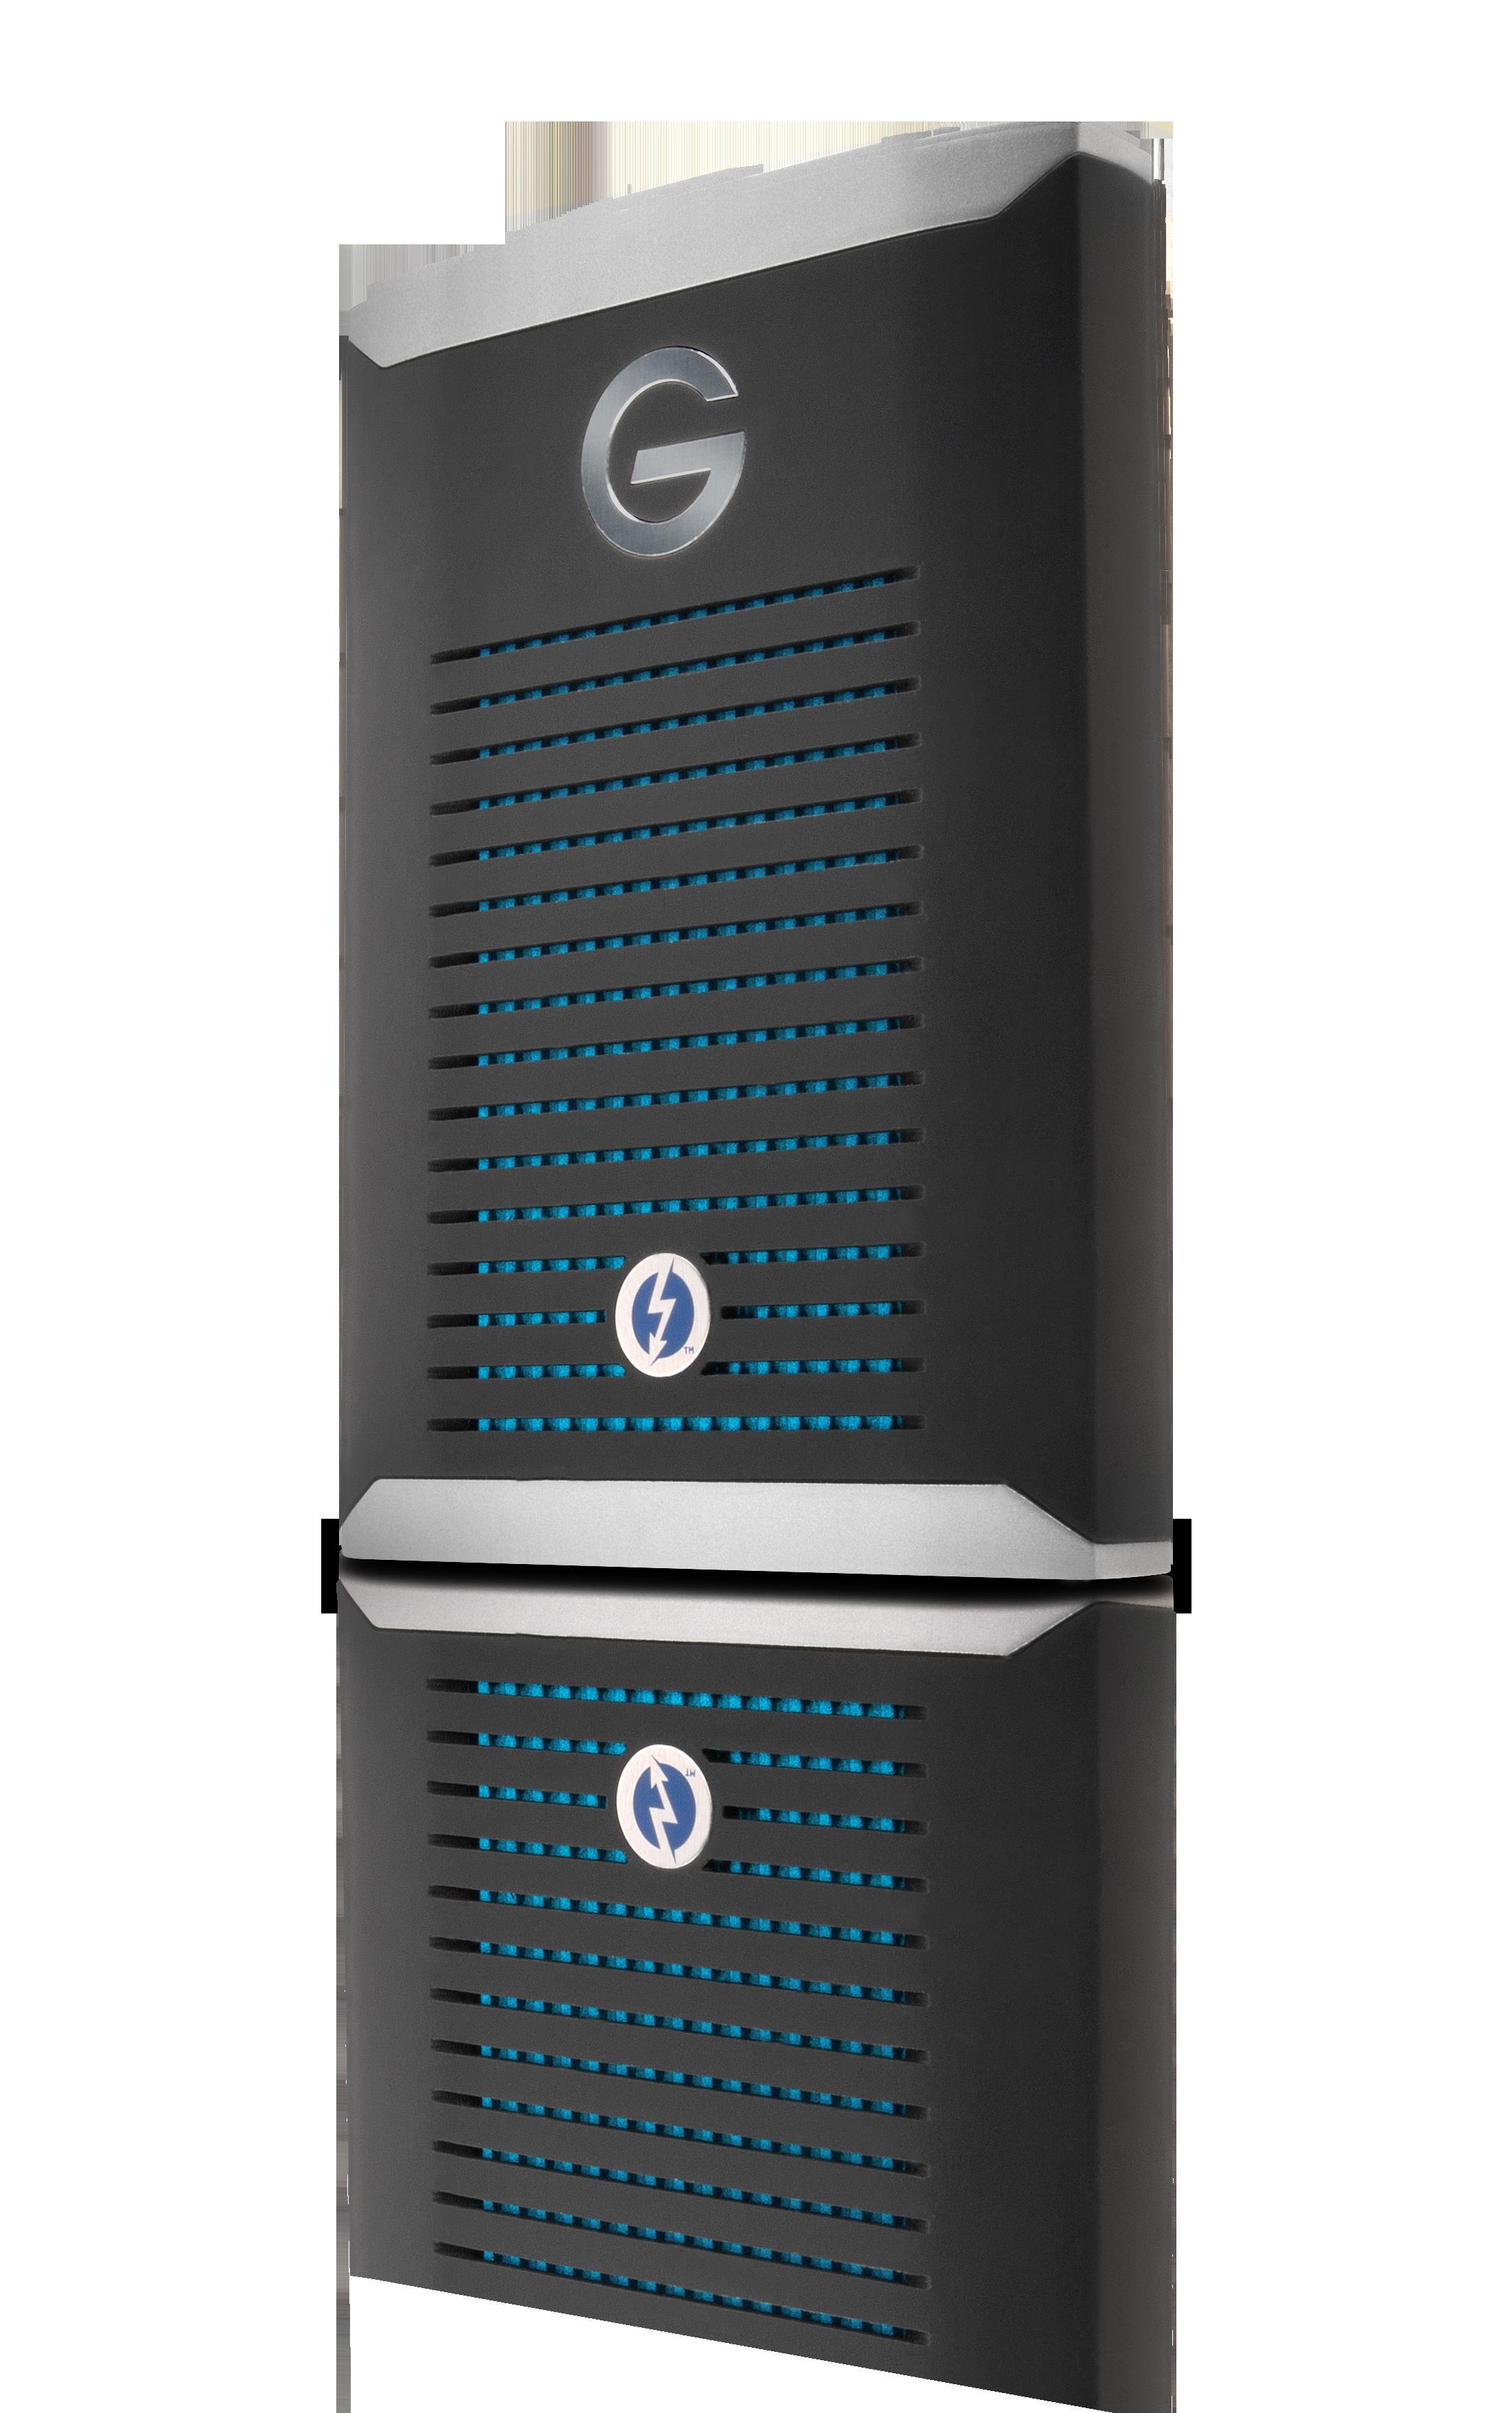 SanDisk PRO G-DRIVE PRO SSD 500GB